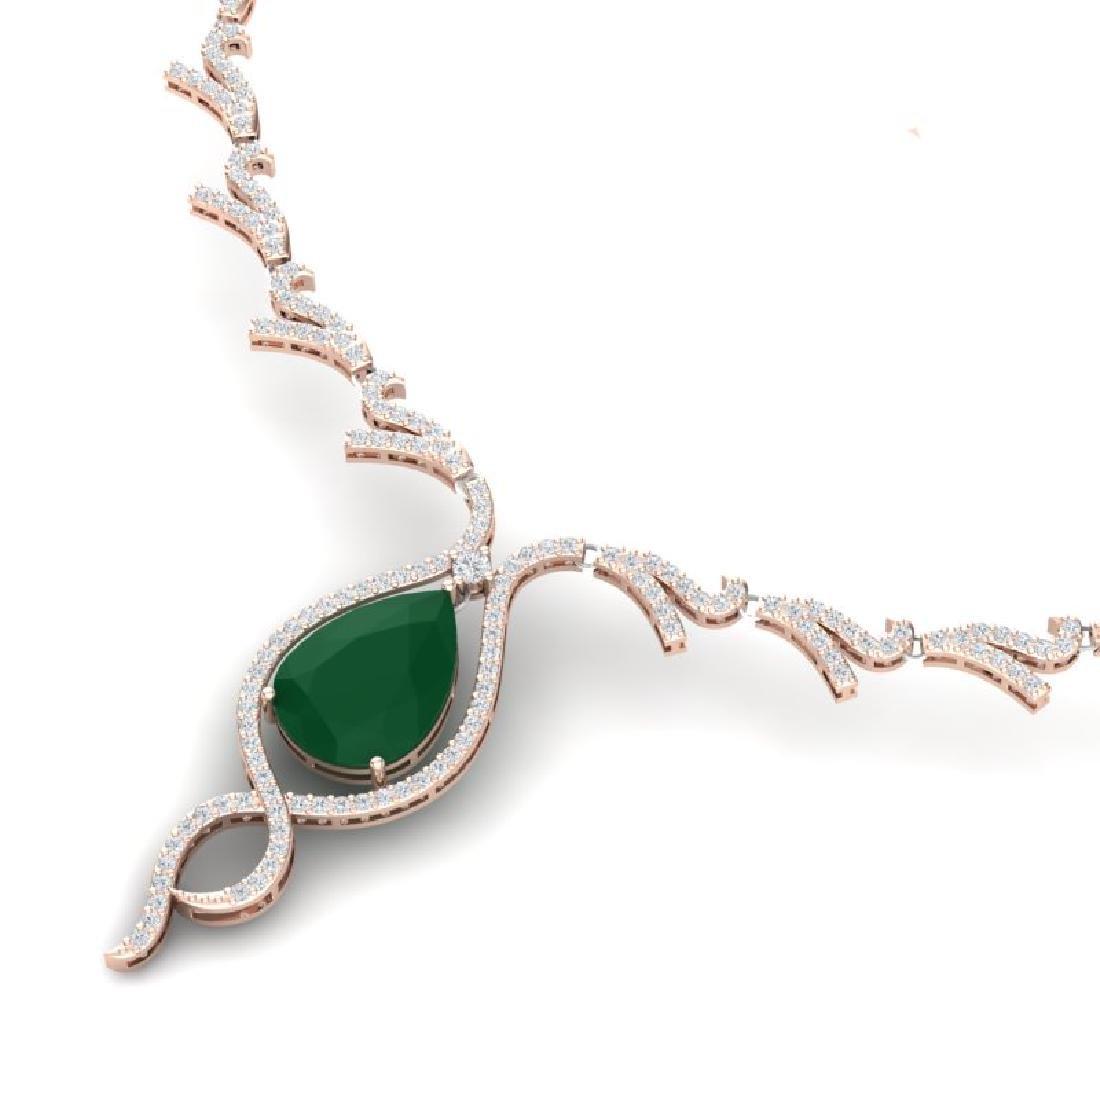 23.43 CTW Royalty Emerald & VS Diamond Necklace 18K - 2